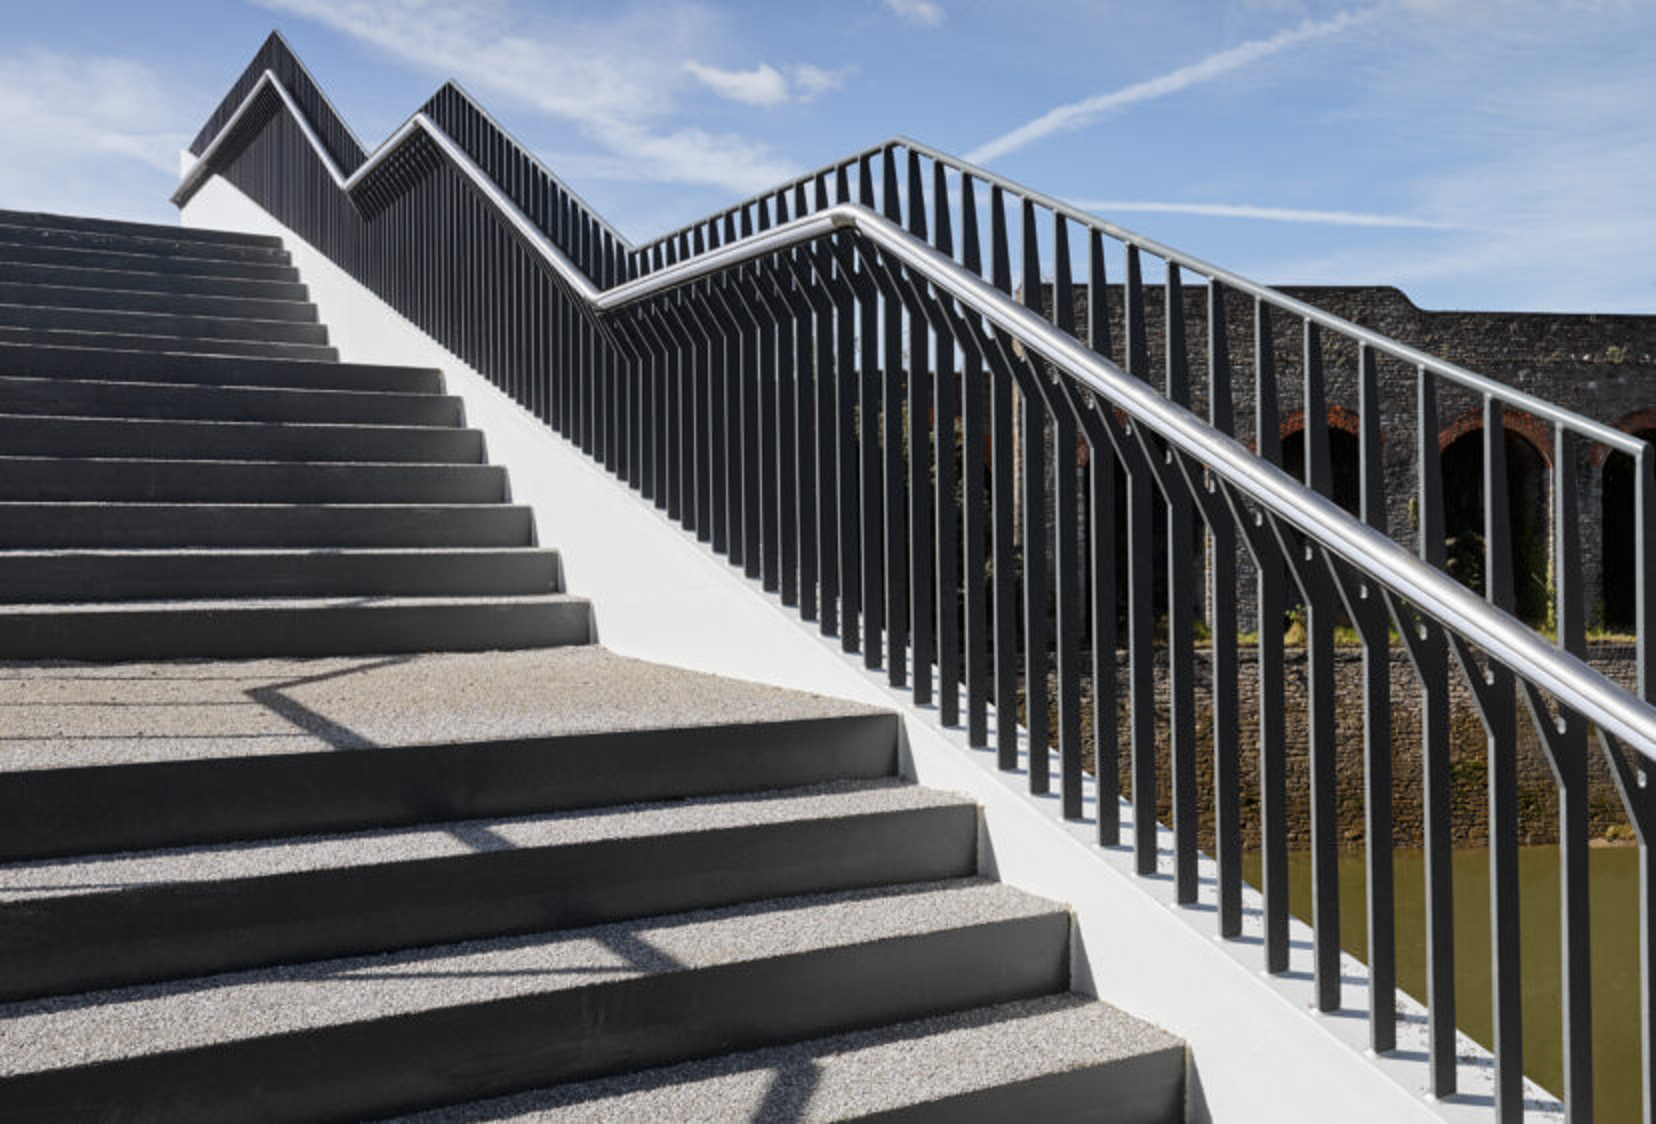 Steps, parapet and handrail of St Philip's footbridge in Bristol